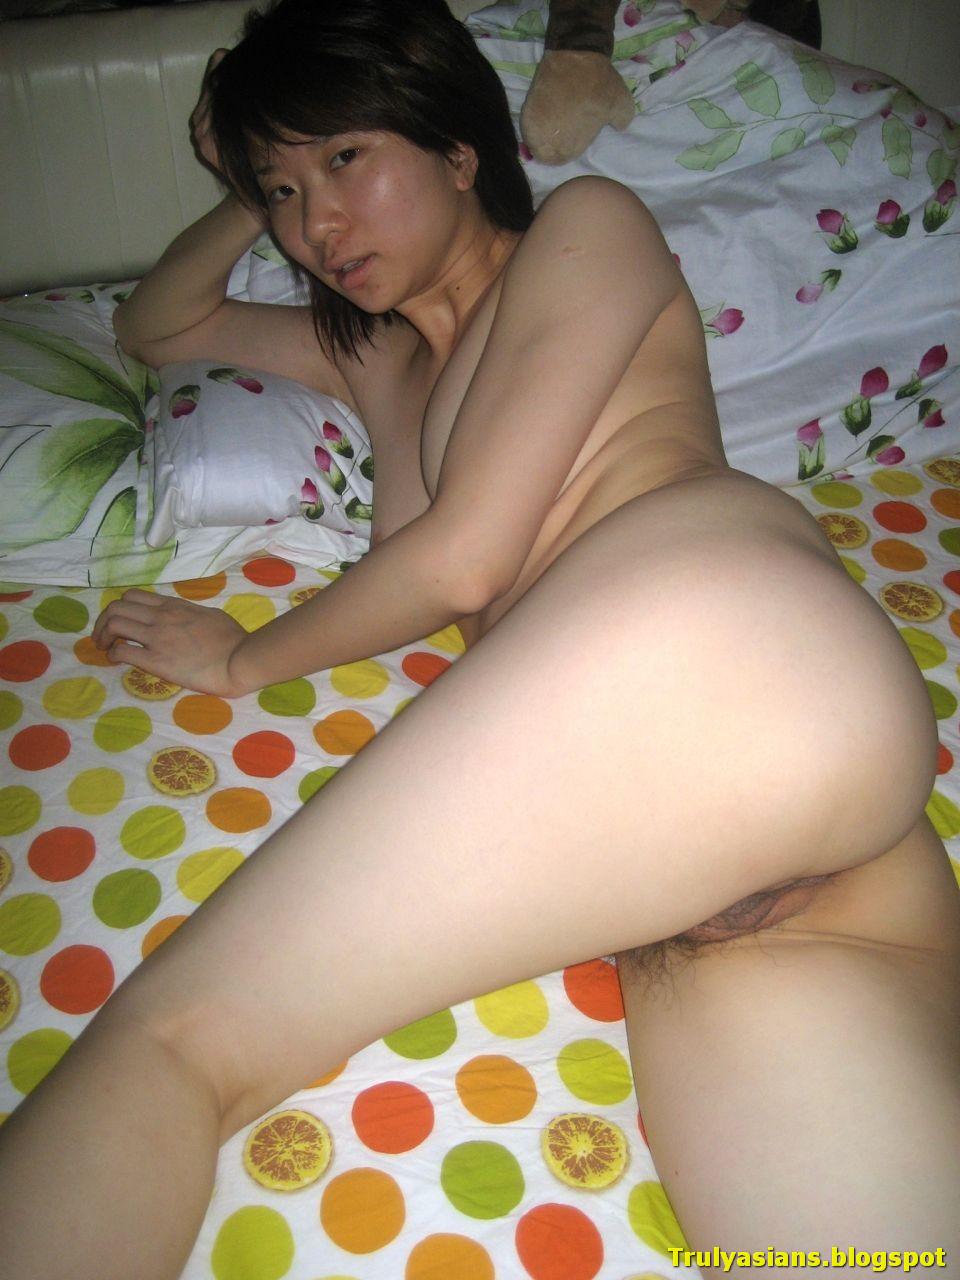 Stories lady nude china girl photos free